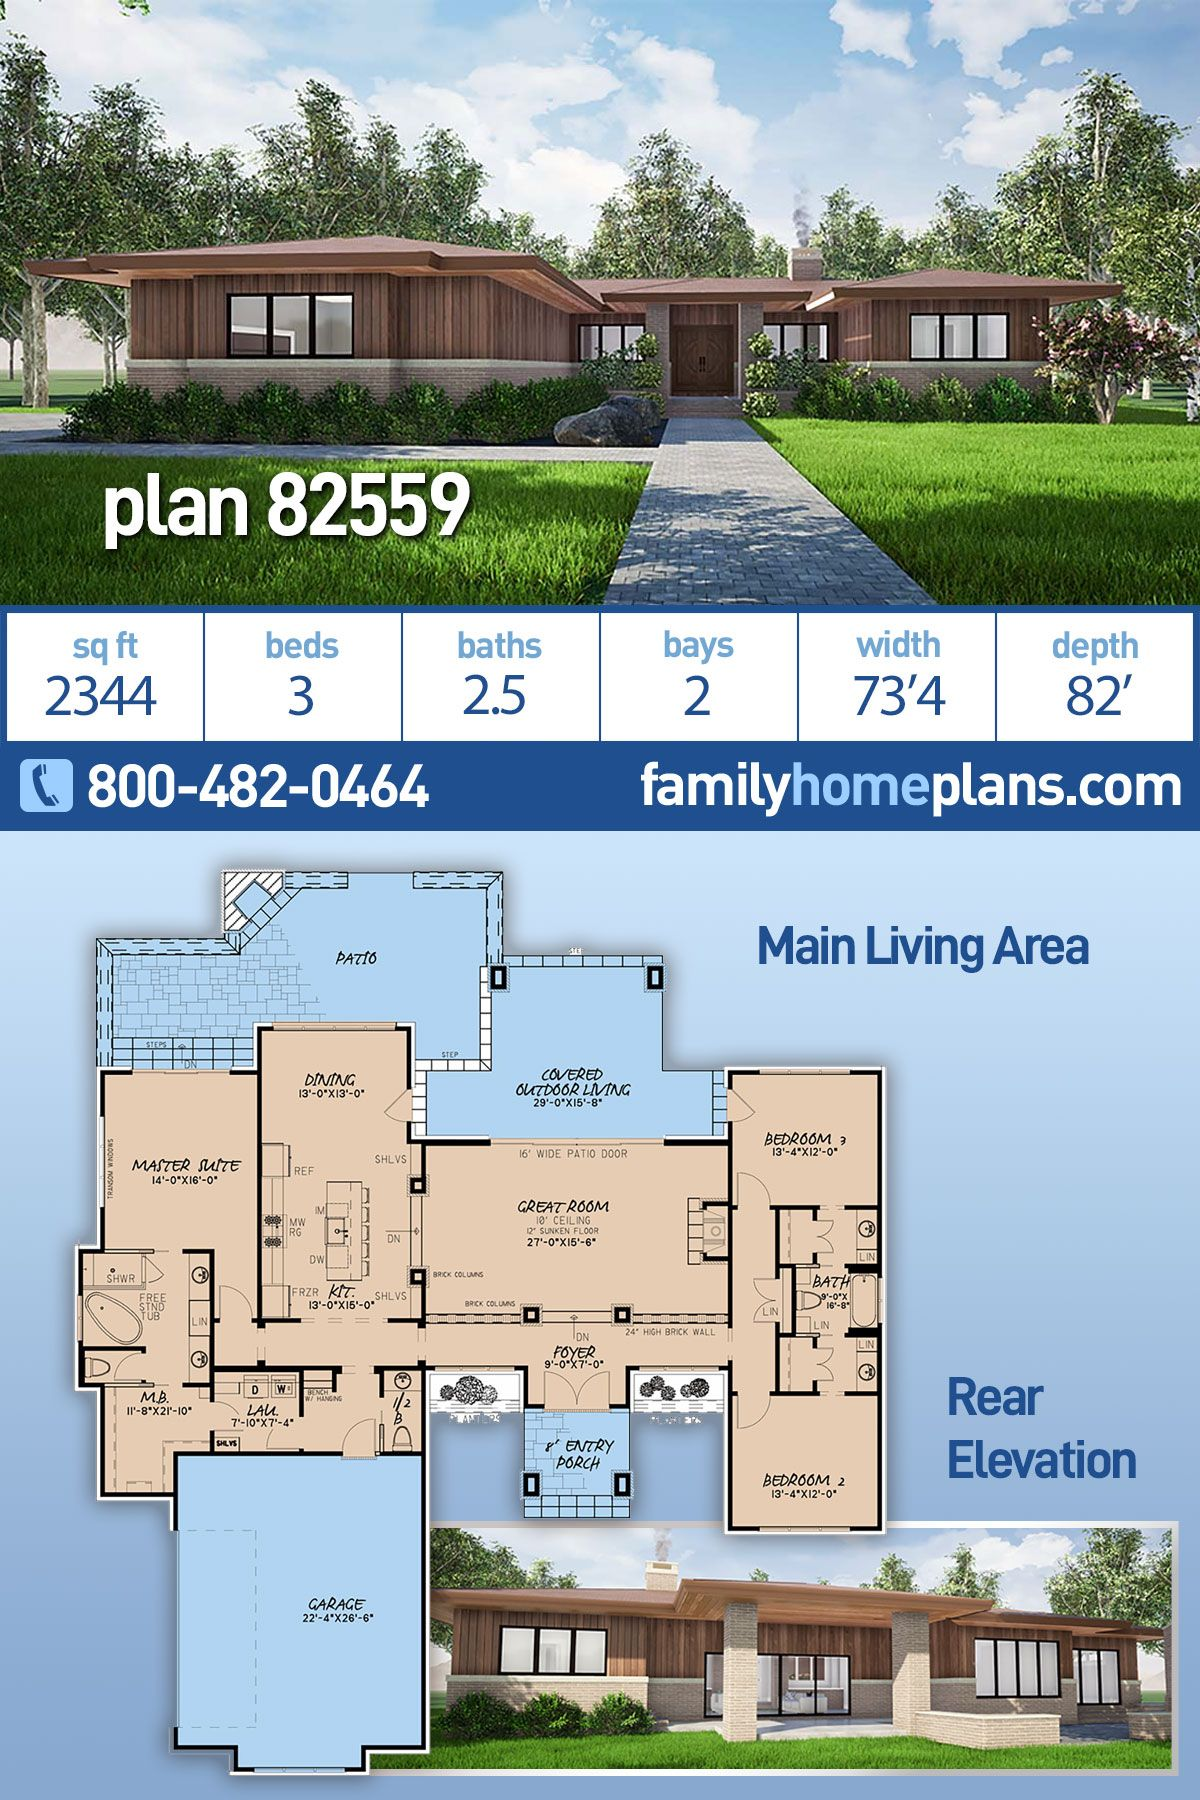 Prairie Style House Plan 82559 With 3 Bed 3 Bath 2 Car Garage In 2020 Modern House Plans Prairie Style Houses House Plans